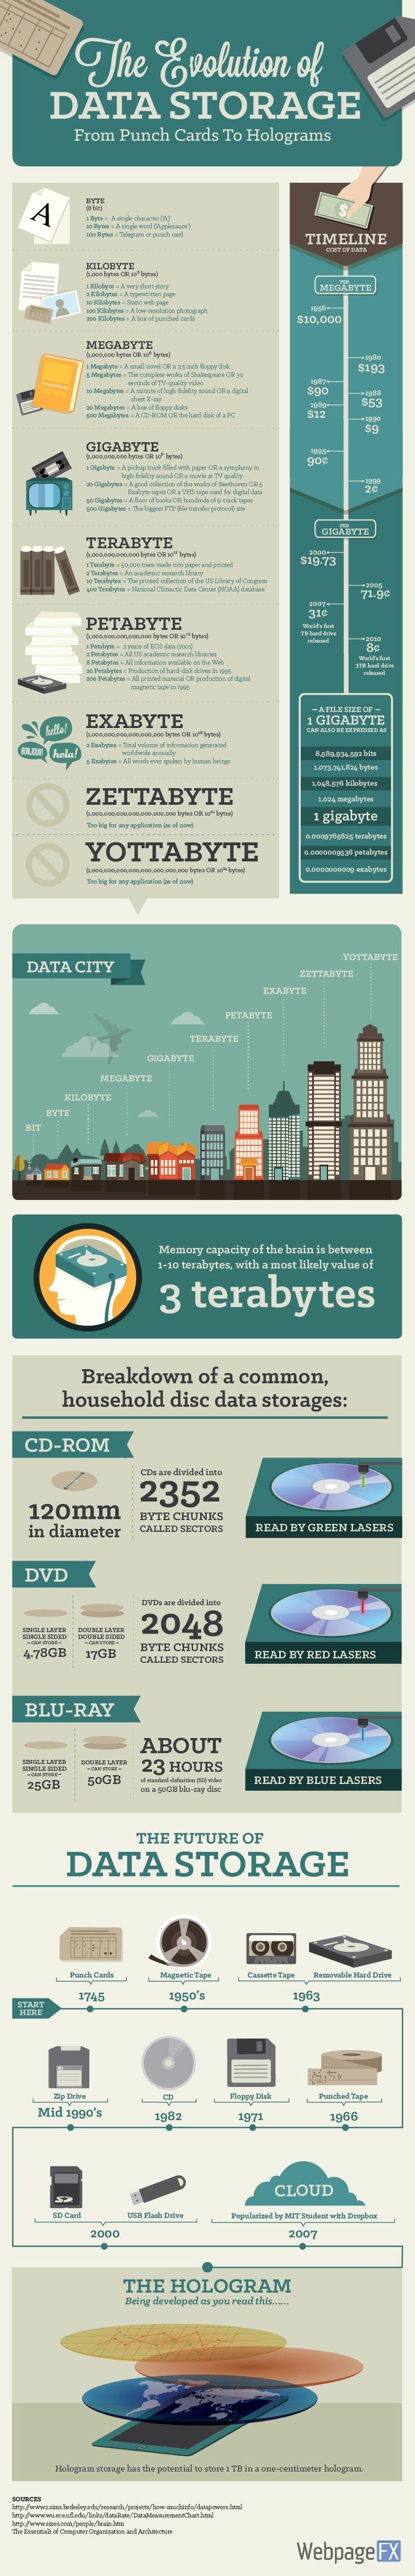 The Evolution of Data Storage #infographic